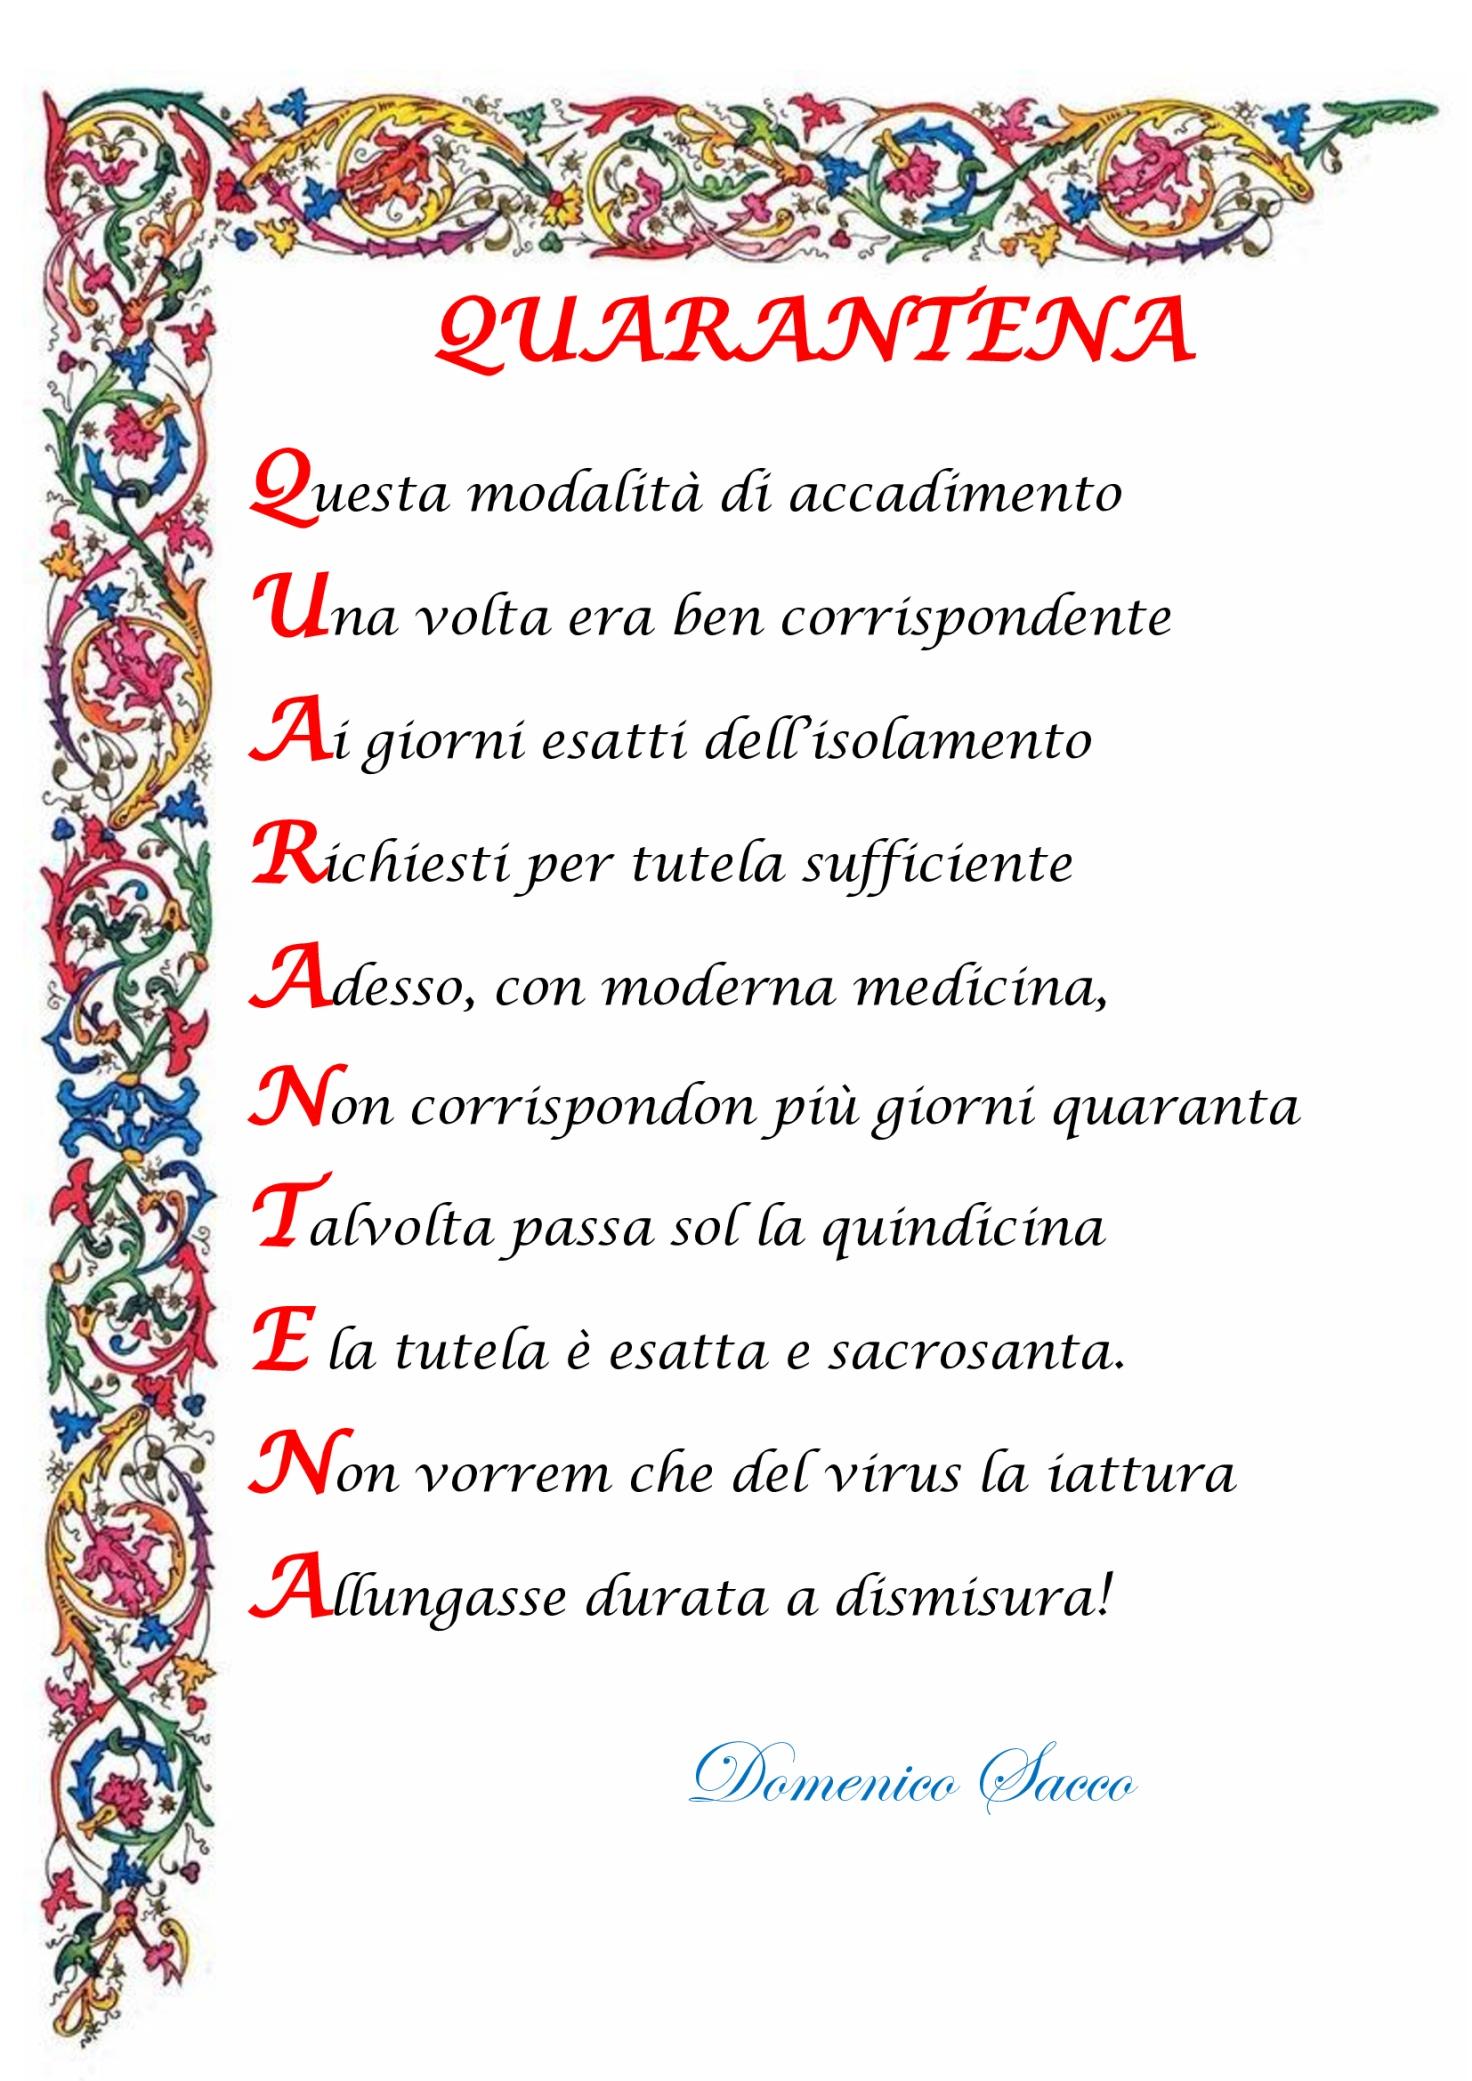 C:\Users\Rossi\Desktop\MARZO 2020\5° serie  Diario\Domenico Sacco 5 QUARANTENA-perg.docx.jpg